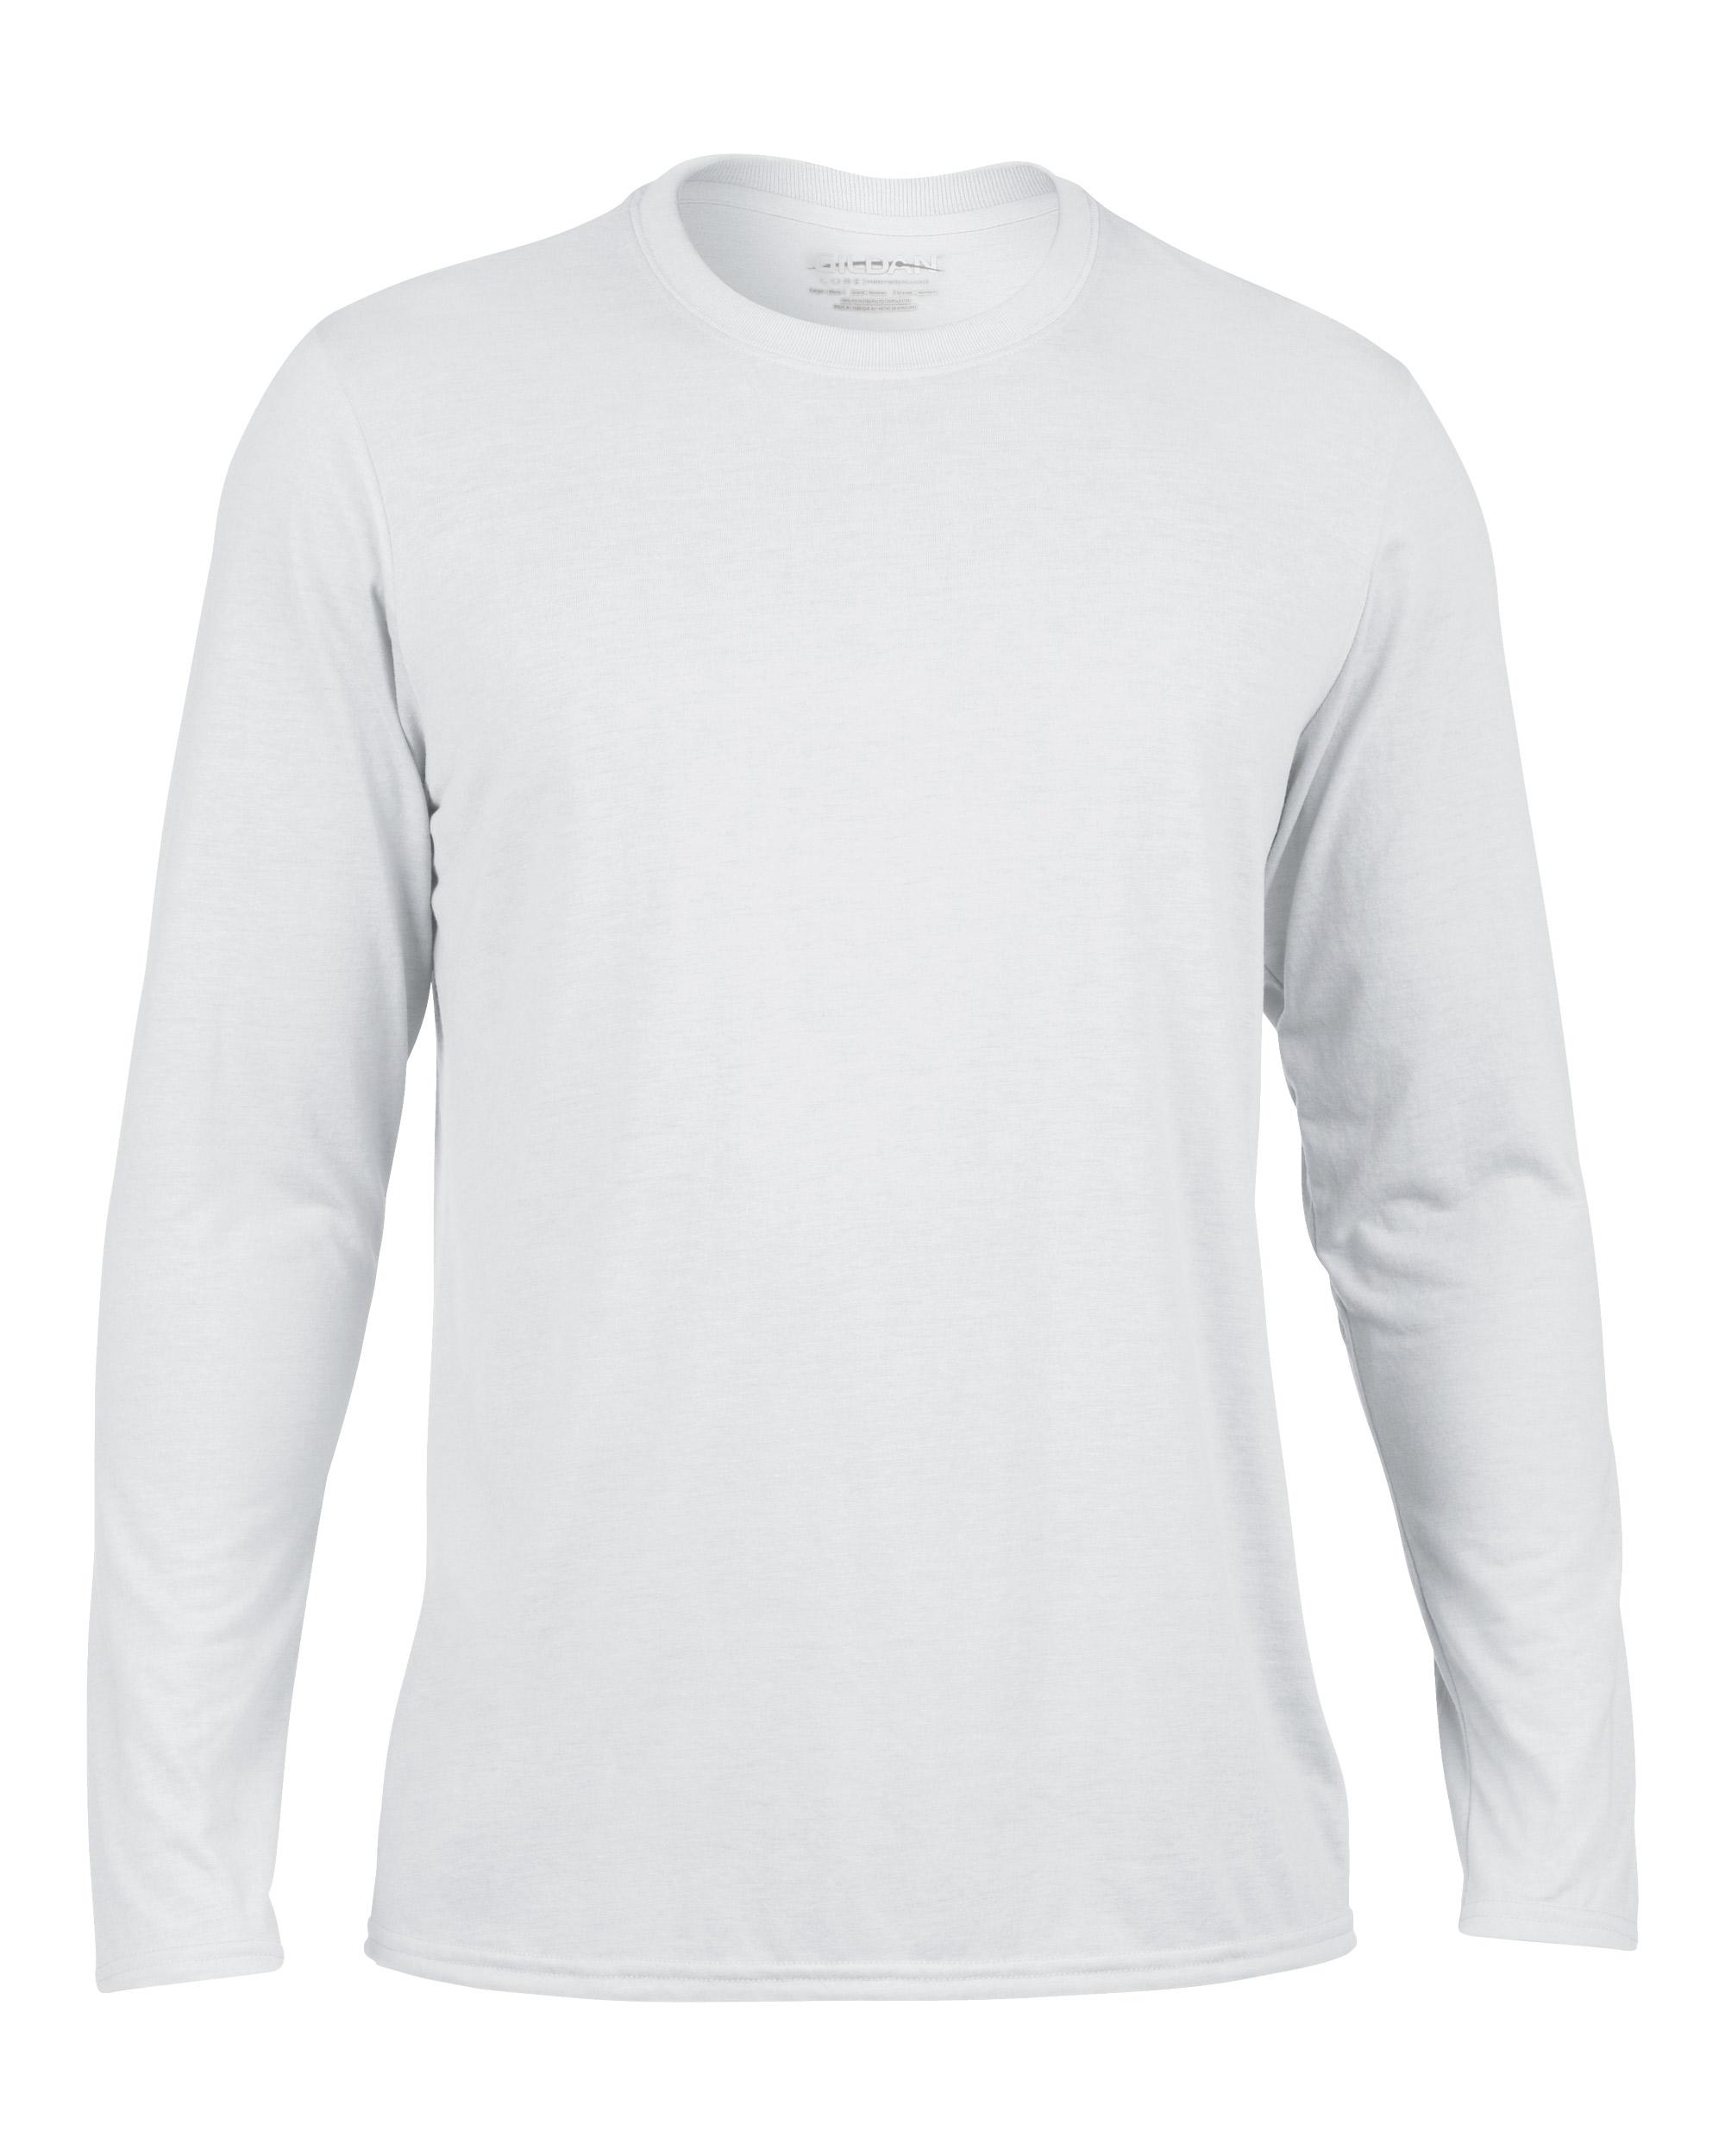 Mens Plain White Long Sleeve T Shirt | Artee Shirt